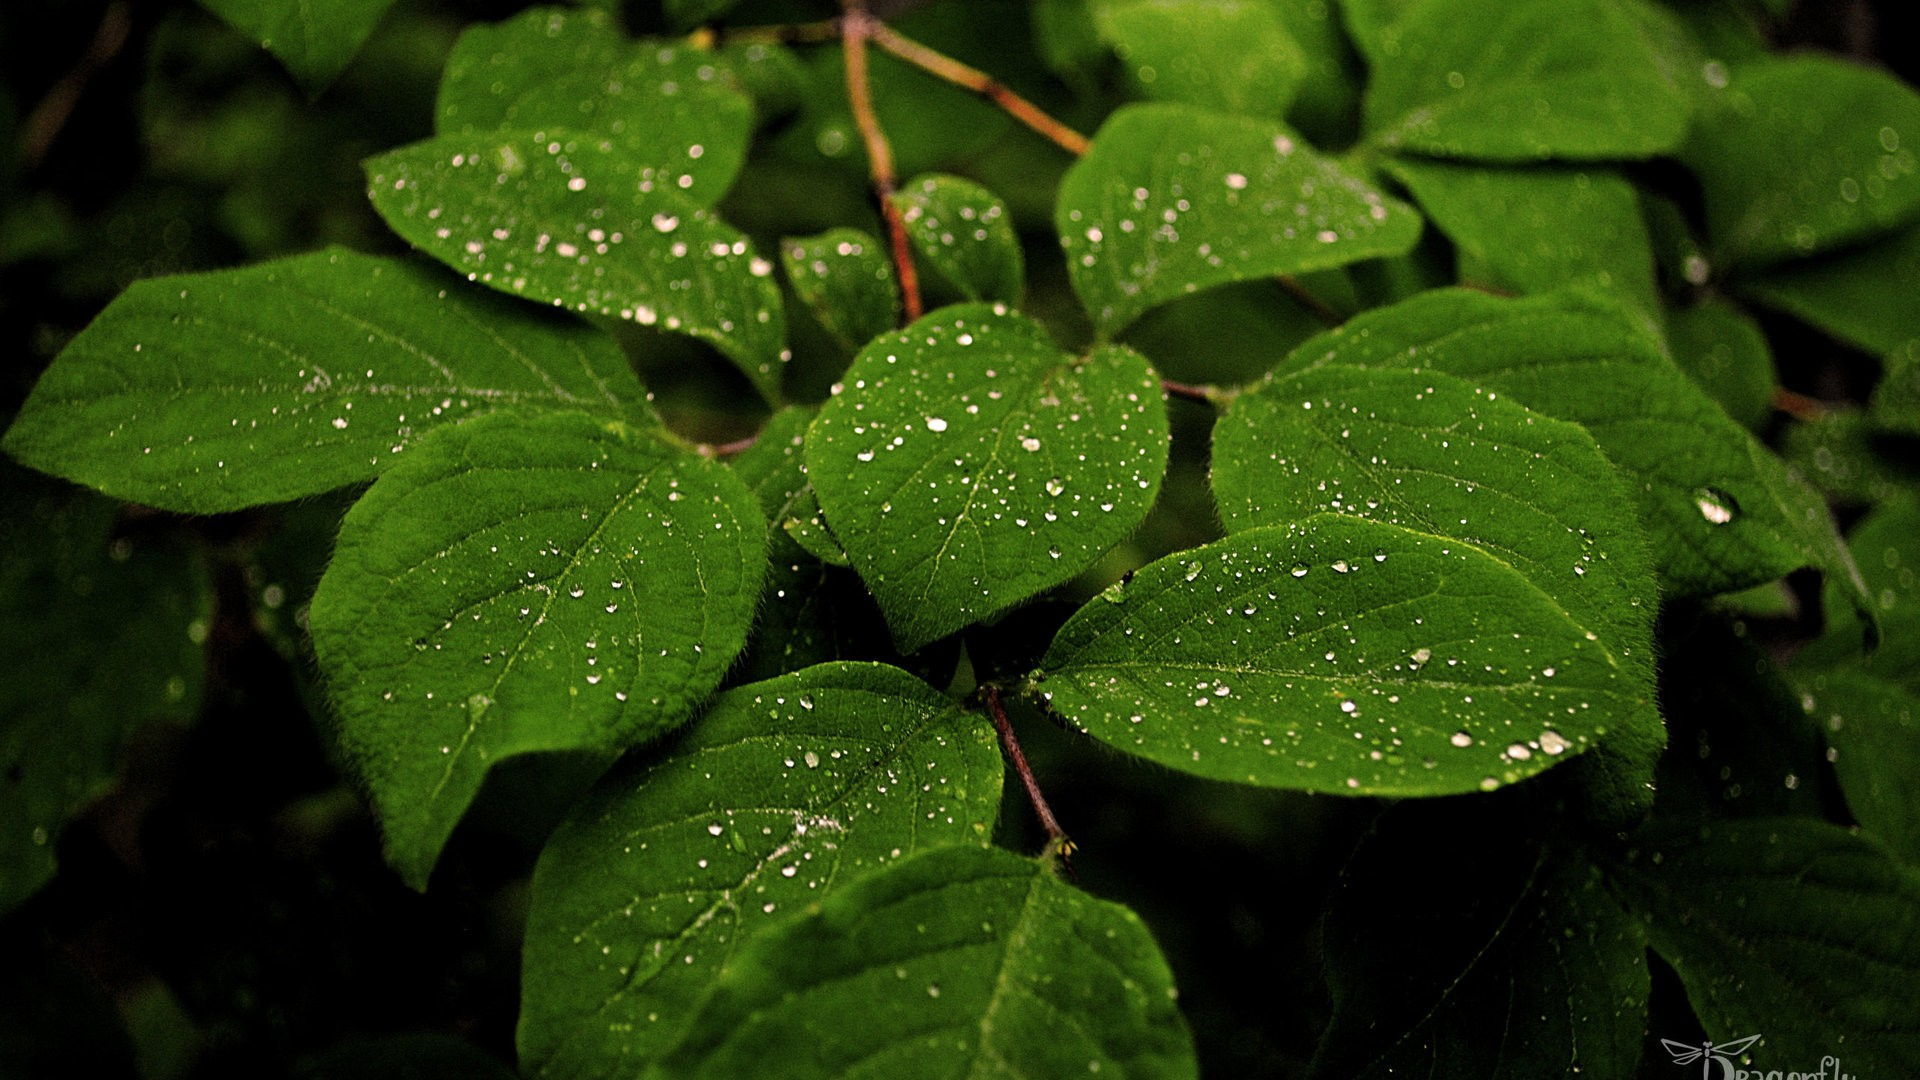 Drop Of Water Falling From A Leaf Dark Background Wallpaper صور خلفيات ايفون 6 وخلفيات ايفون 6 بلس ميكساتك